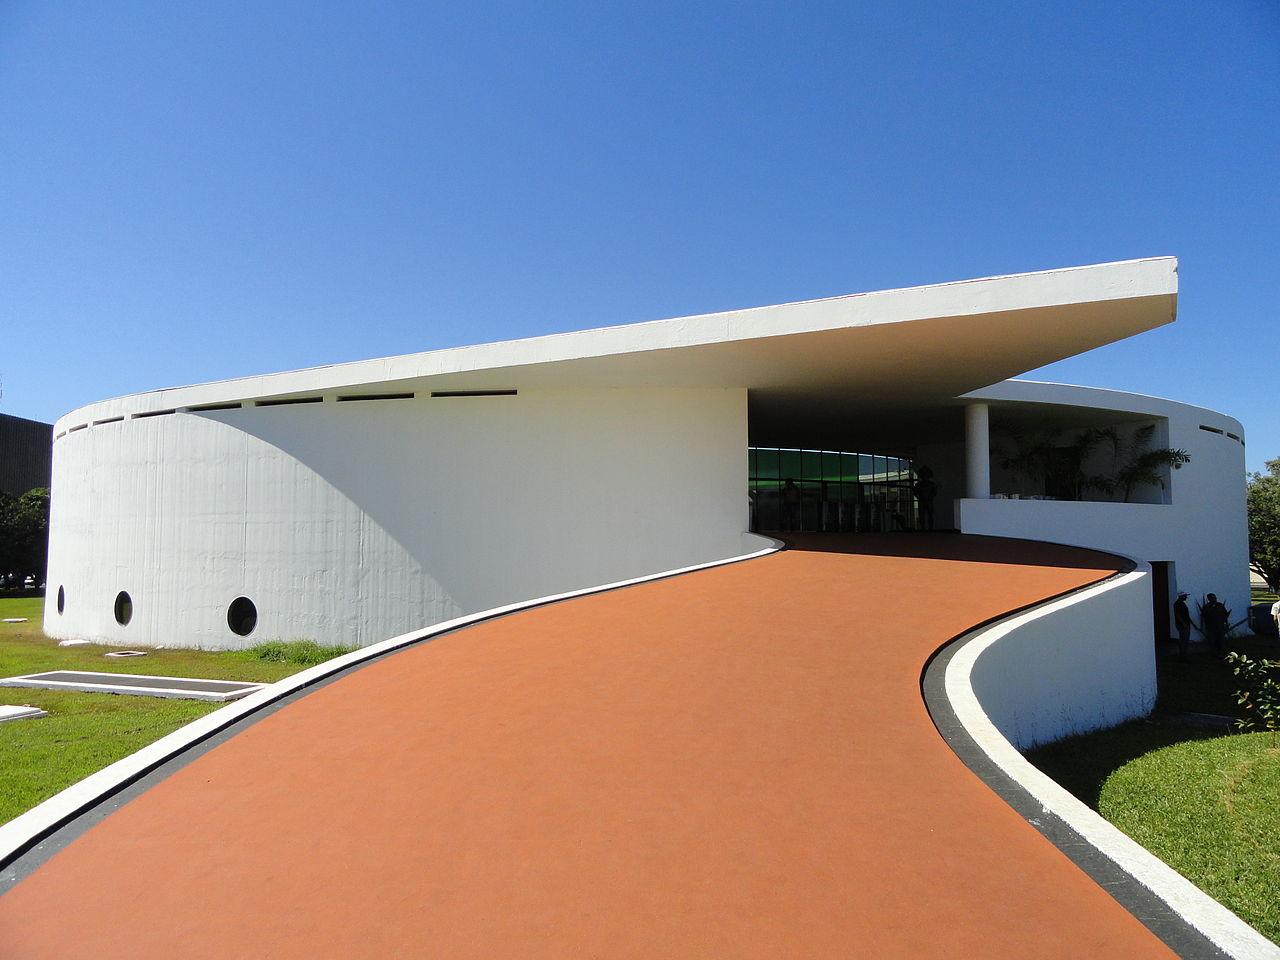 1280px-Memorial_dos_Povos_Indígenas_-_Brasilia_-_DSC00475.JPG